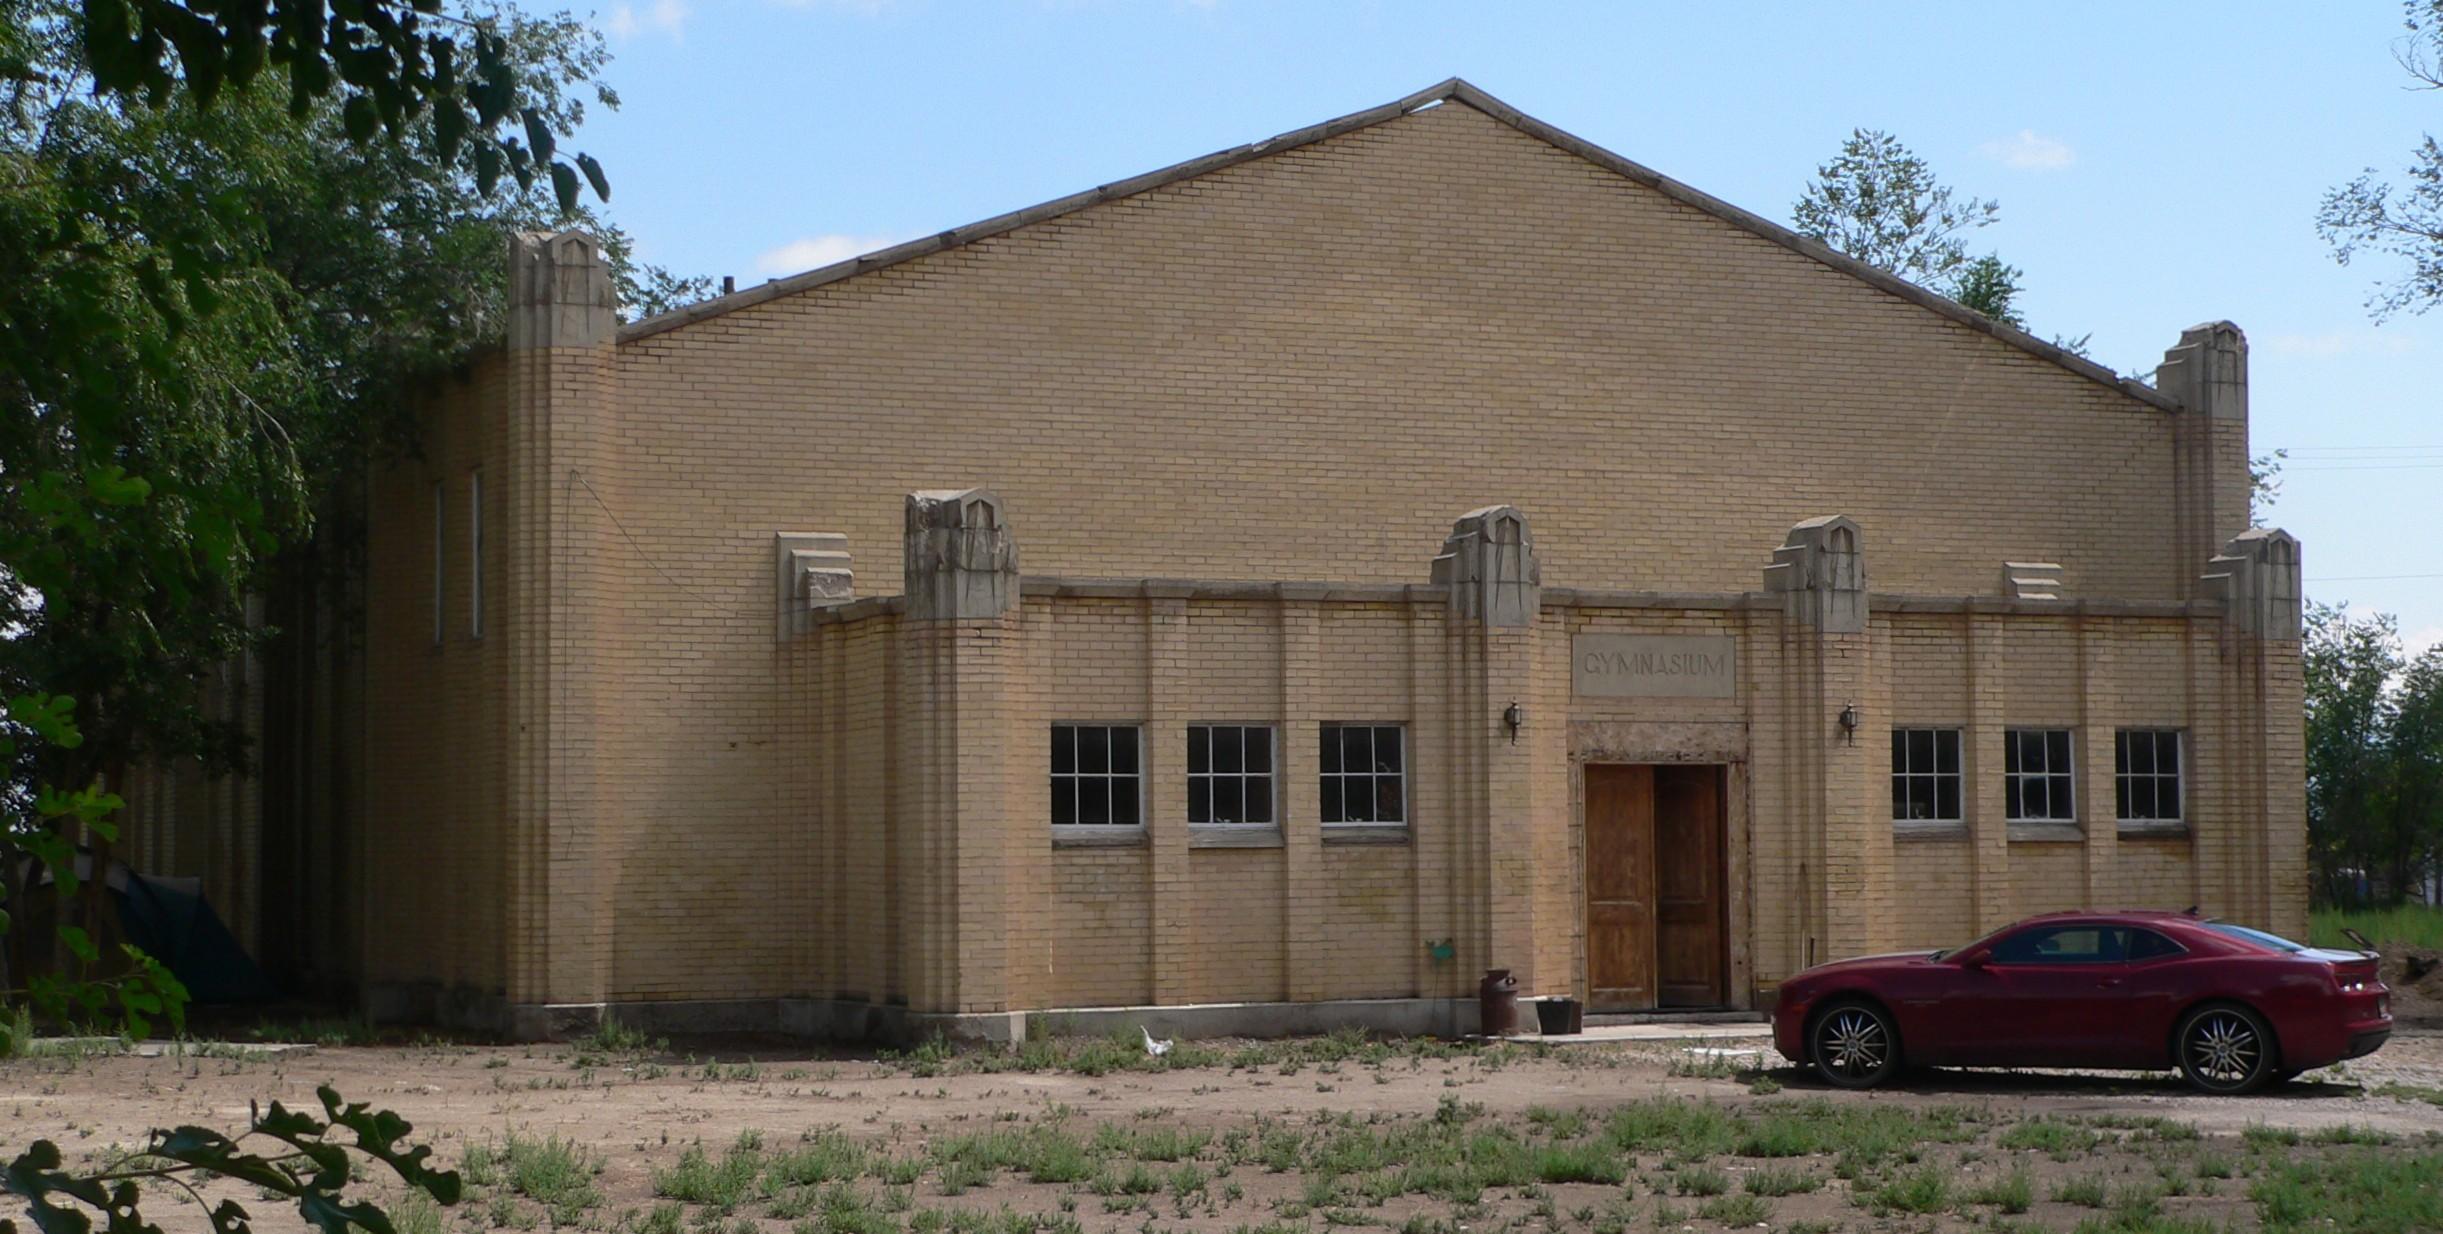 File:Hinckley, Utah HS gym from NW 2.JPG - Wikimedia Commons